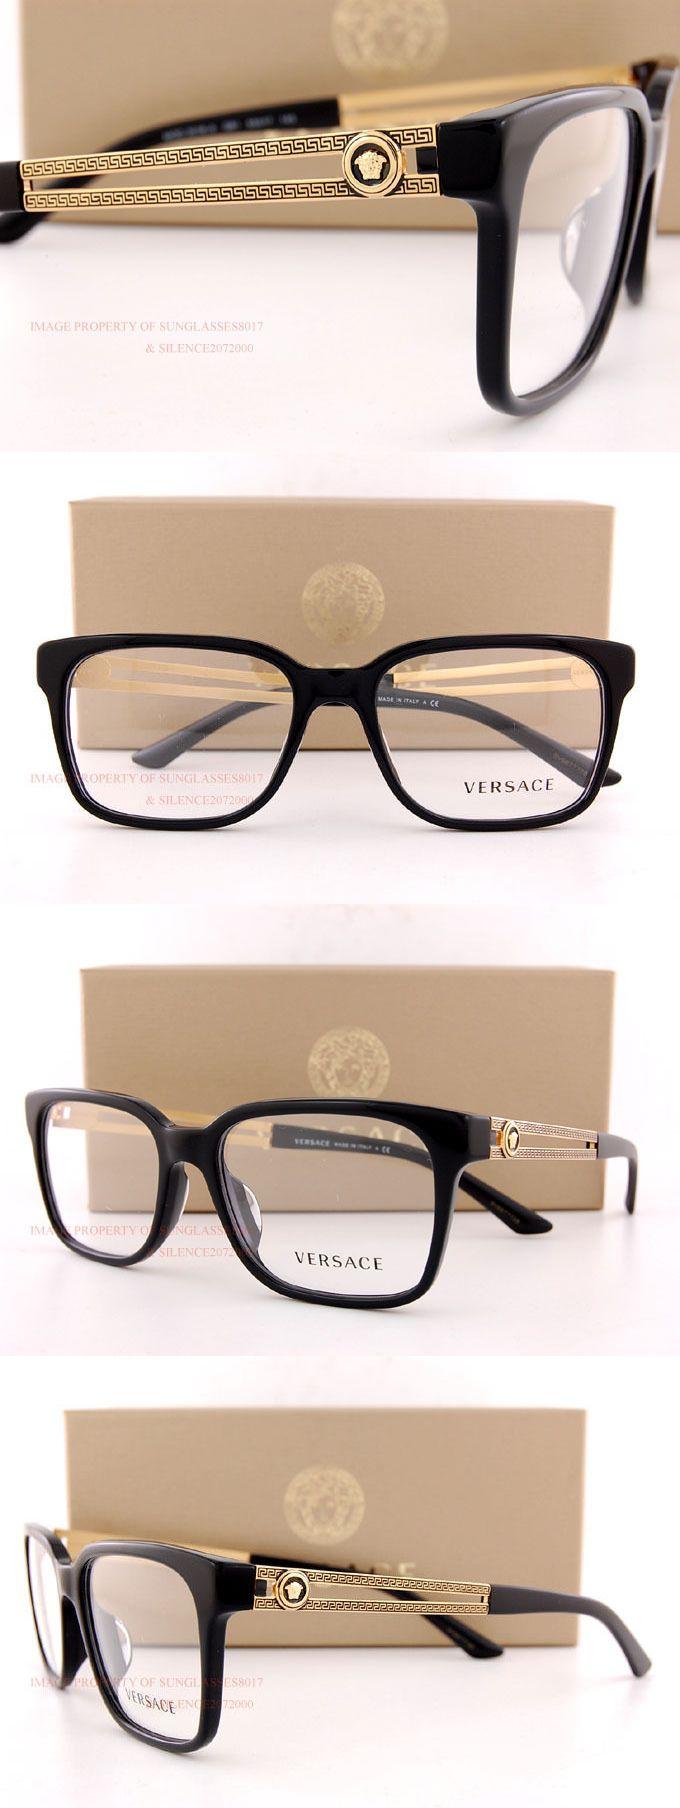 c0287877730b Eyeglass Frames: Brand New Versace Eyeglass Frames 3218 Gb1 Black Women Men  100% Authentic Sz 55 -> BUY IT NOW ONLY: $159.99 on eBay!